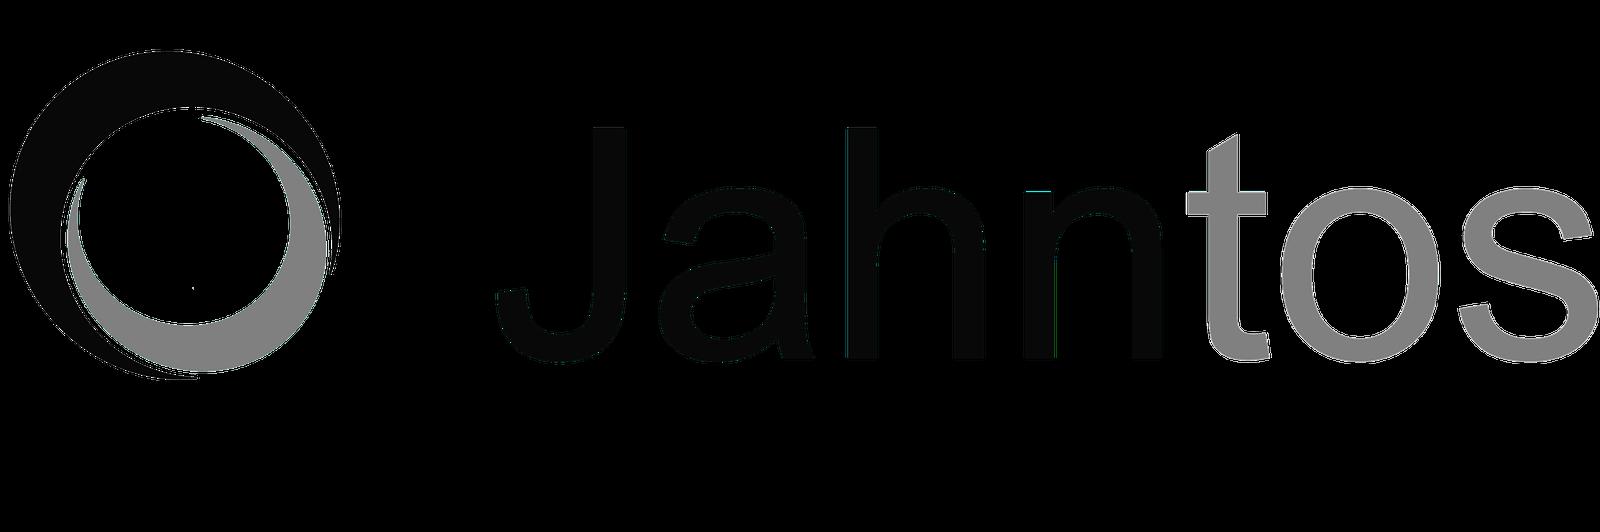 Jahntos